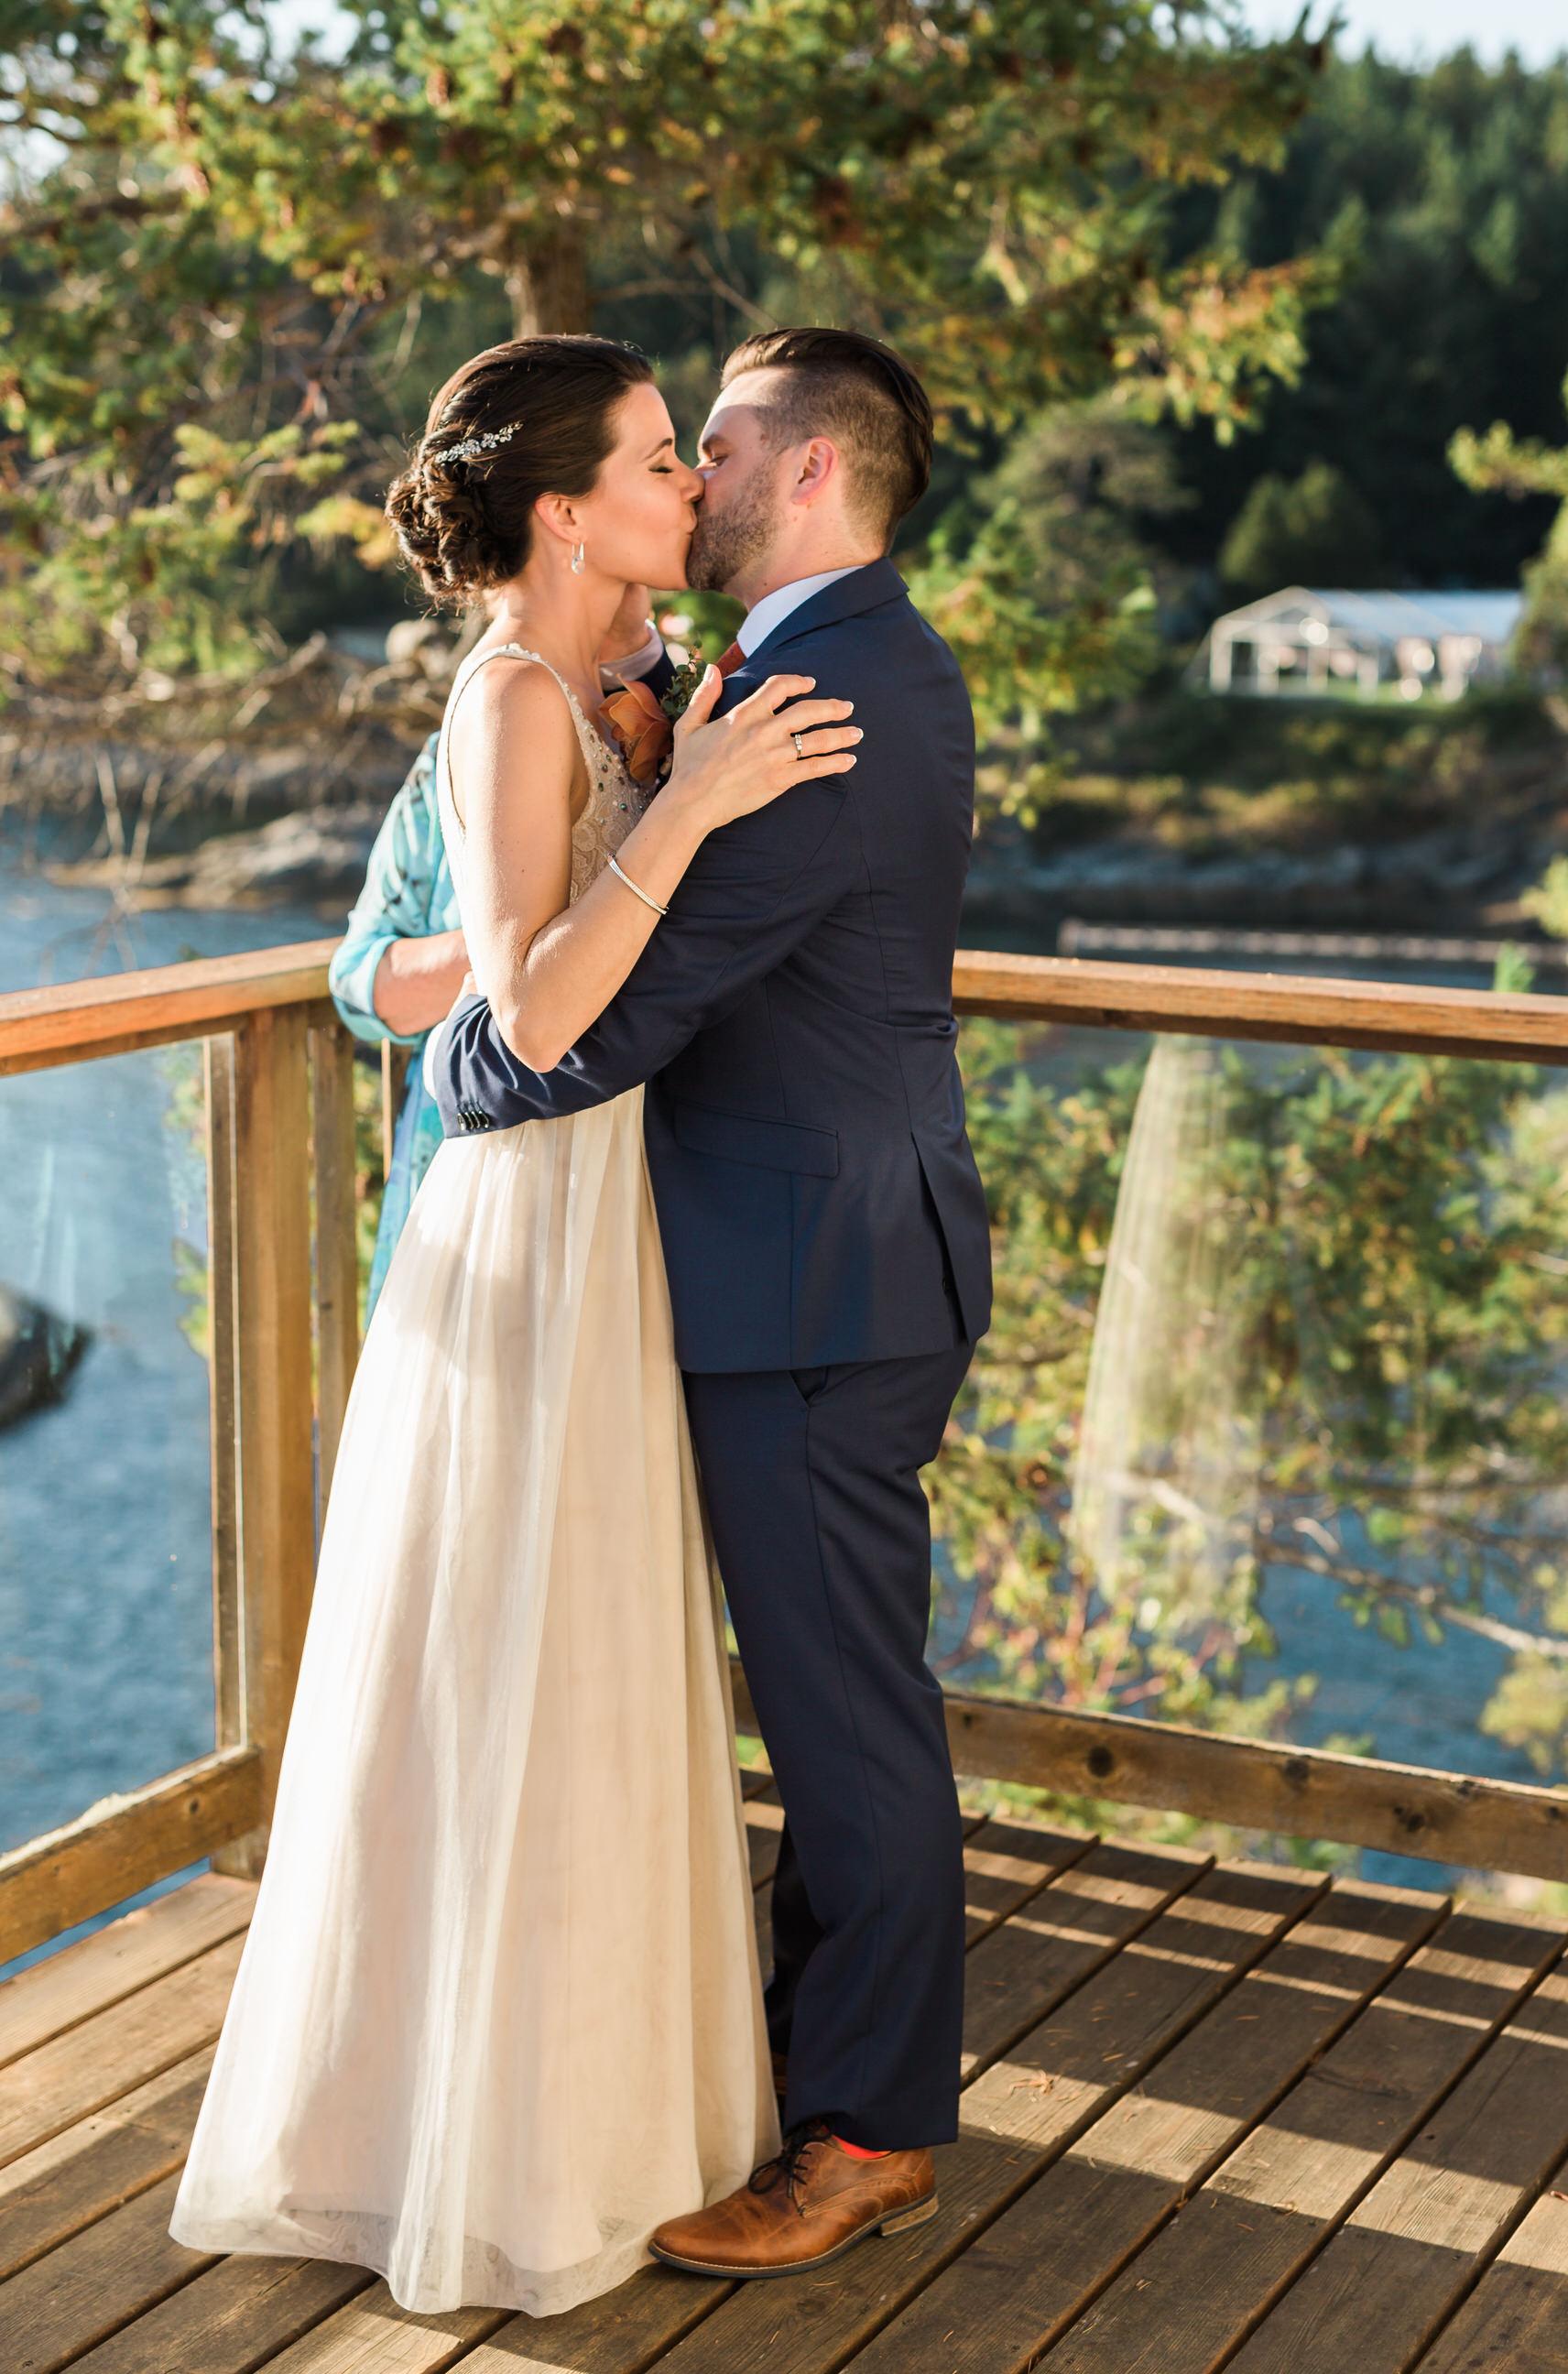 Rockwater Secret Cove Resort Wedding - Sunshine Coast BC Wedding Photographer - Vancouver Wedding Photographer - Sunshine Coast Elopement Photos - IMG_0511.jpg